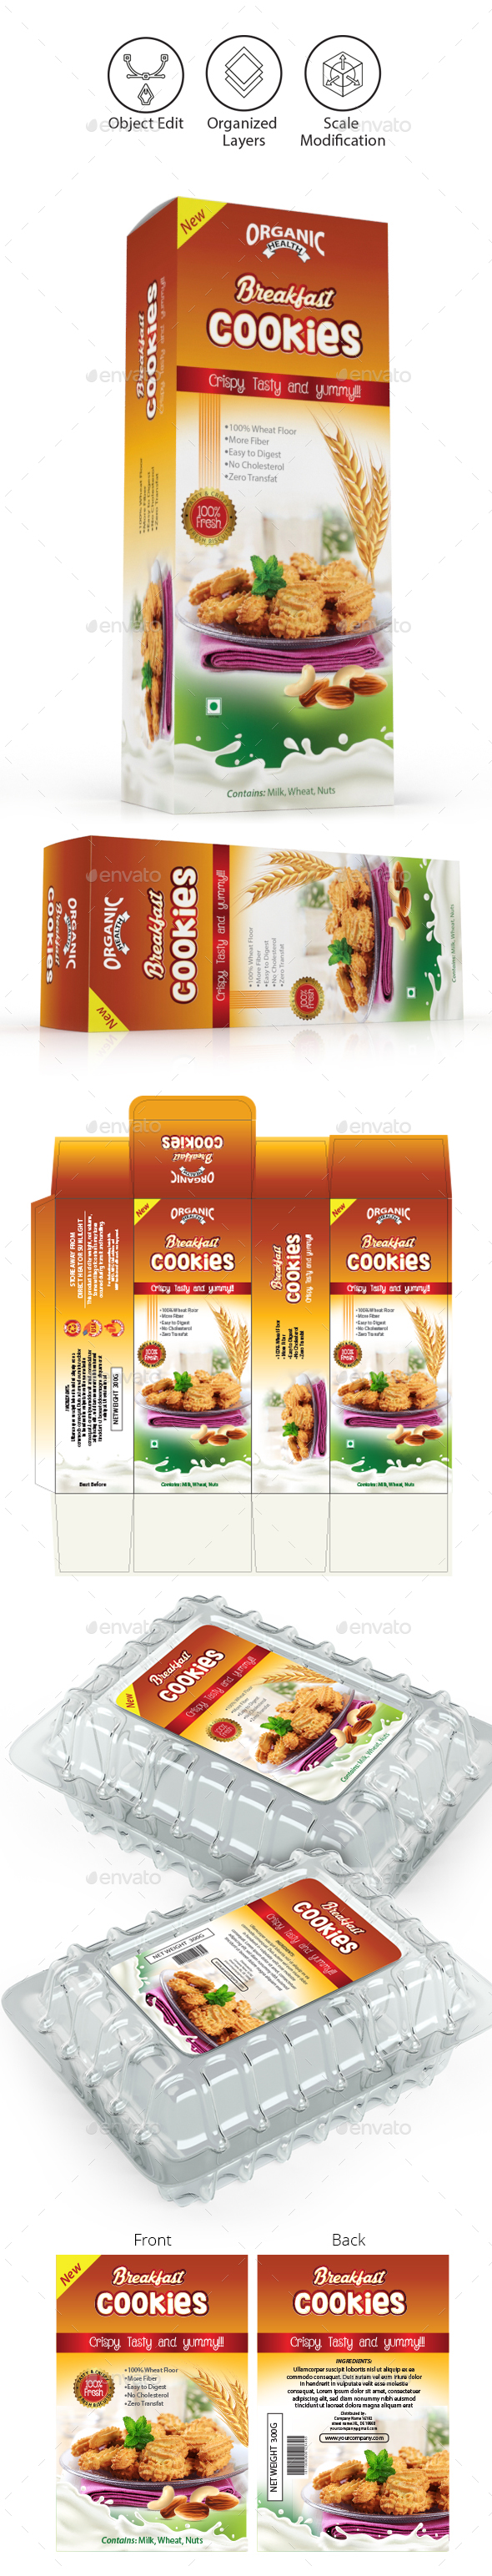 Cookies Packaging Templates - Packaging Print Templates